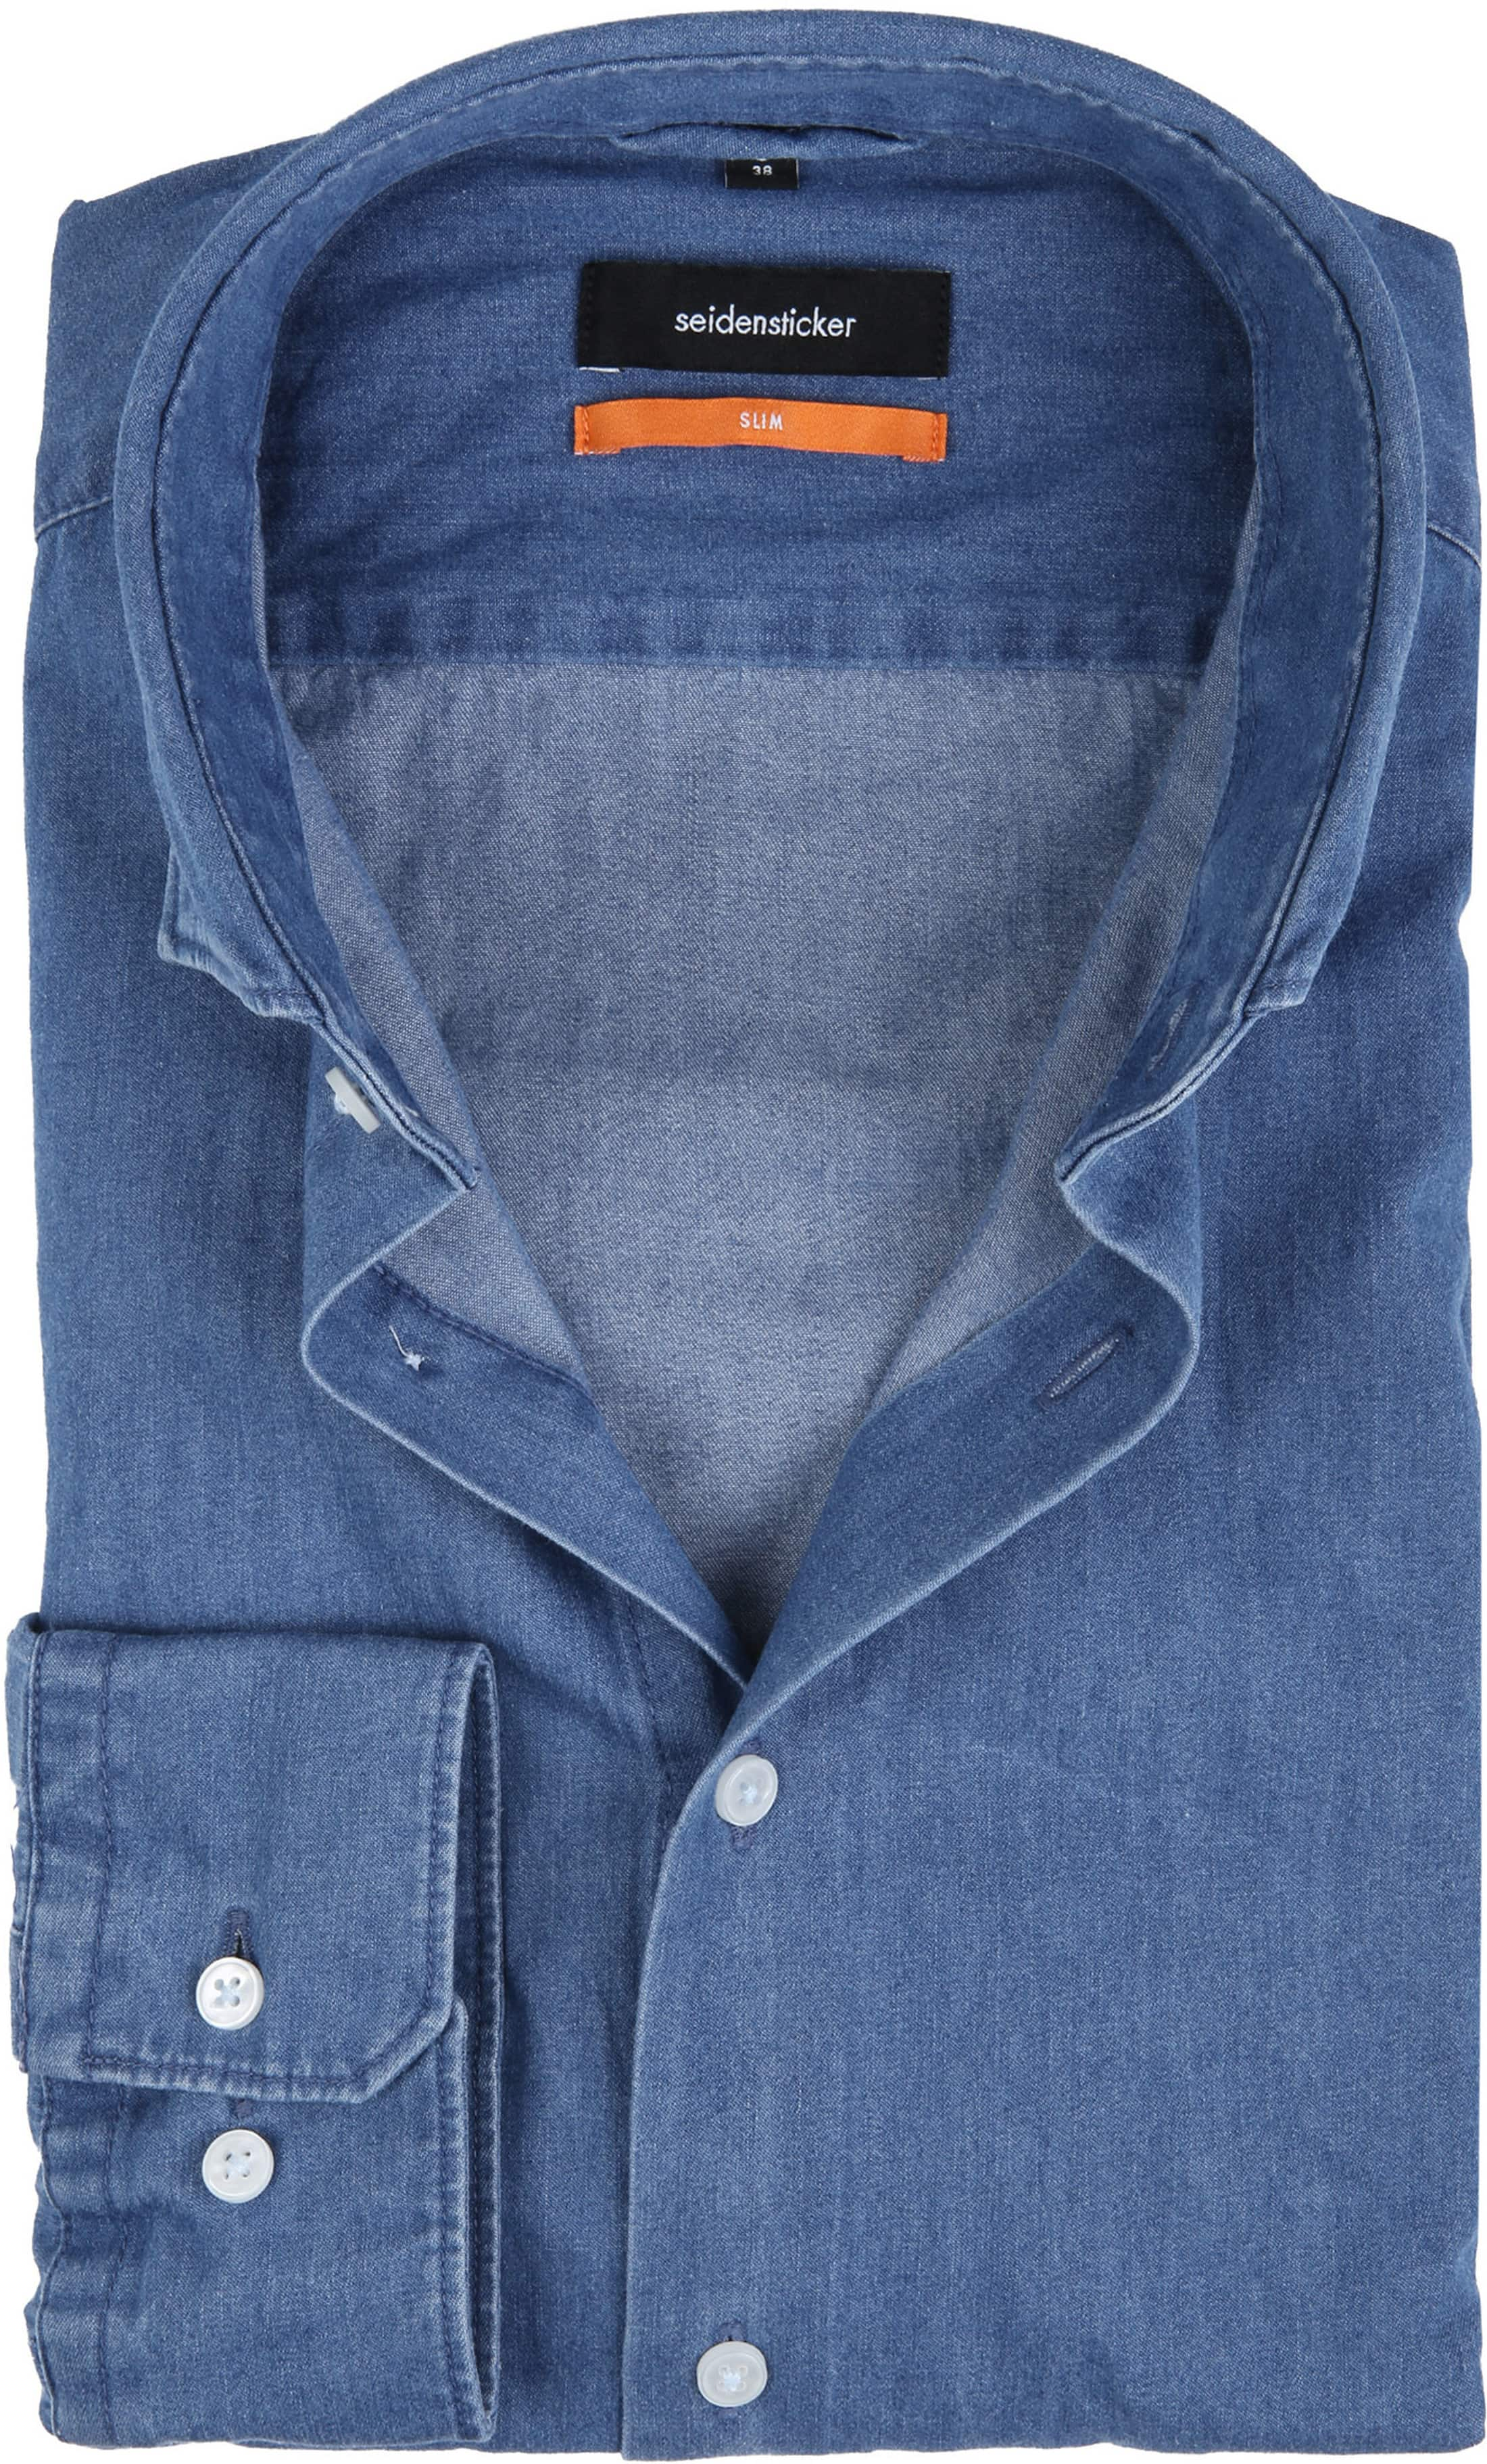 Seidensticker Overhemd SF Denim Blue foto 0